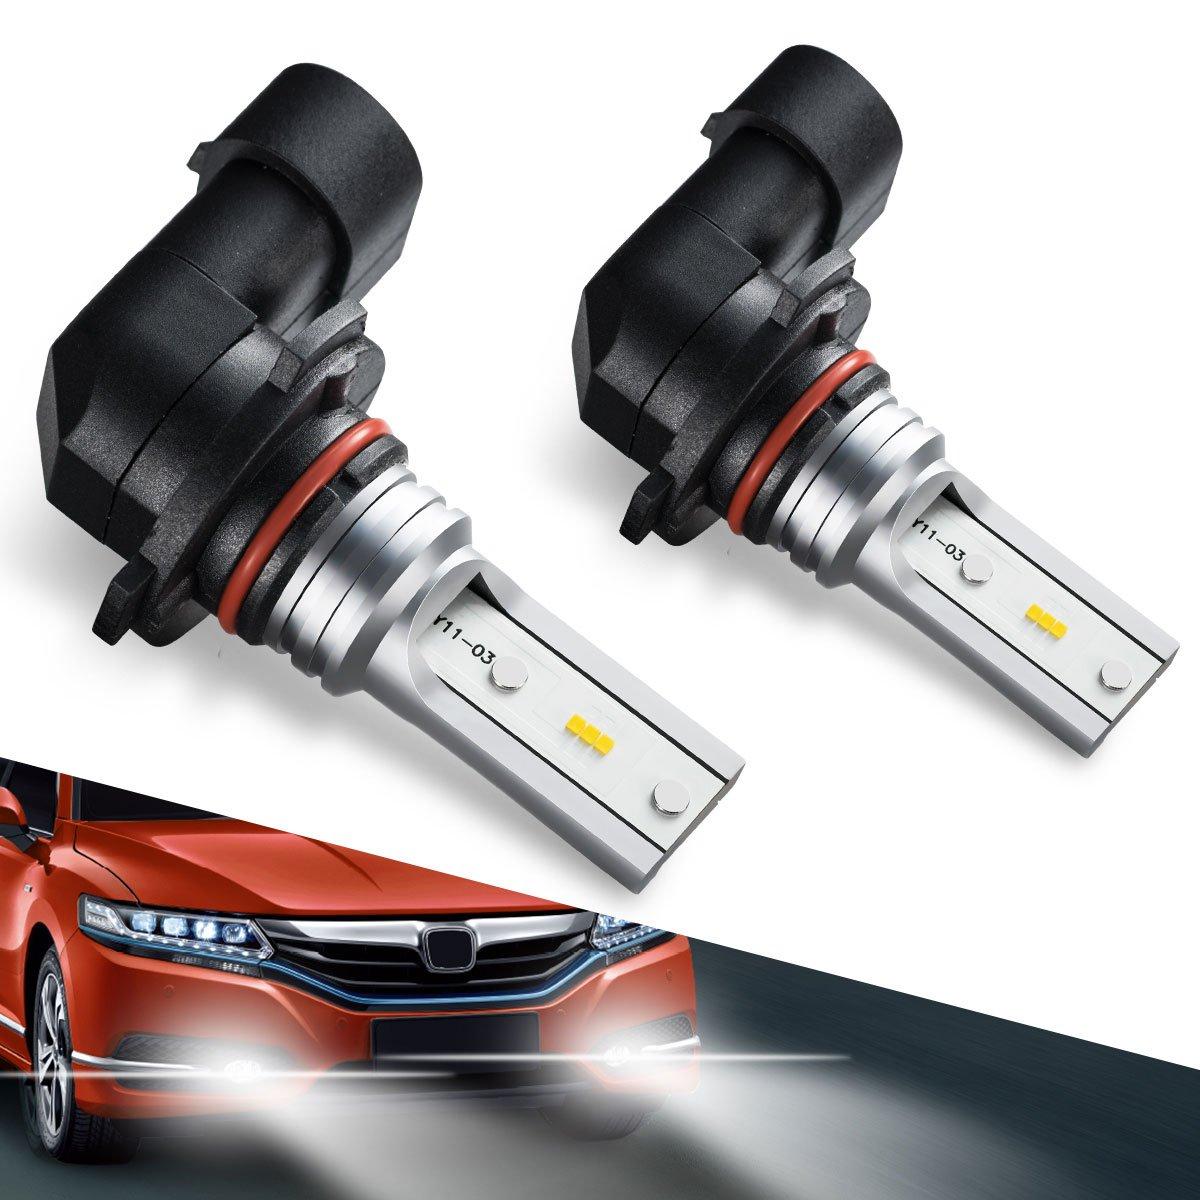 5202 5201 LED Fog Light Bulbs, PS19W CSP High Power LED Fog Lamps Bulbs for DRL or Fog Lights Xenon White Marsauto